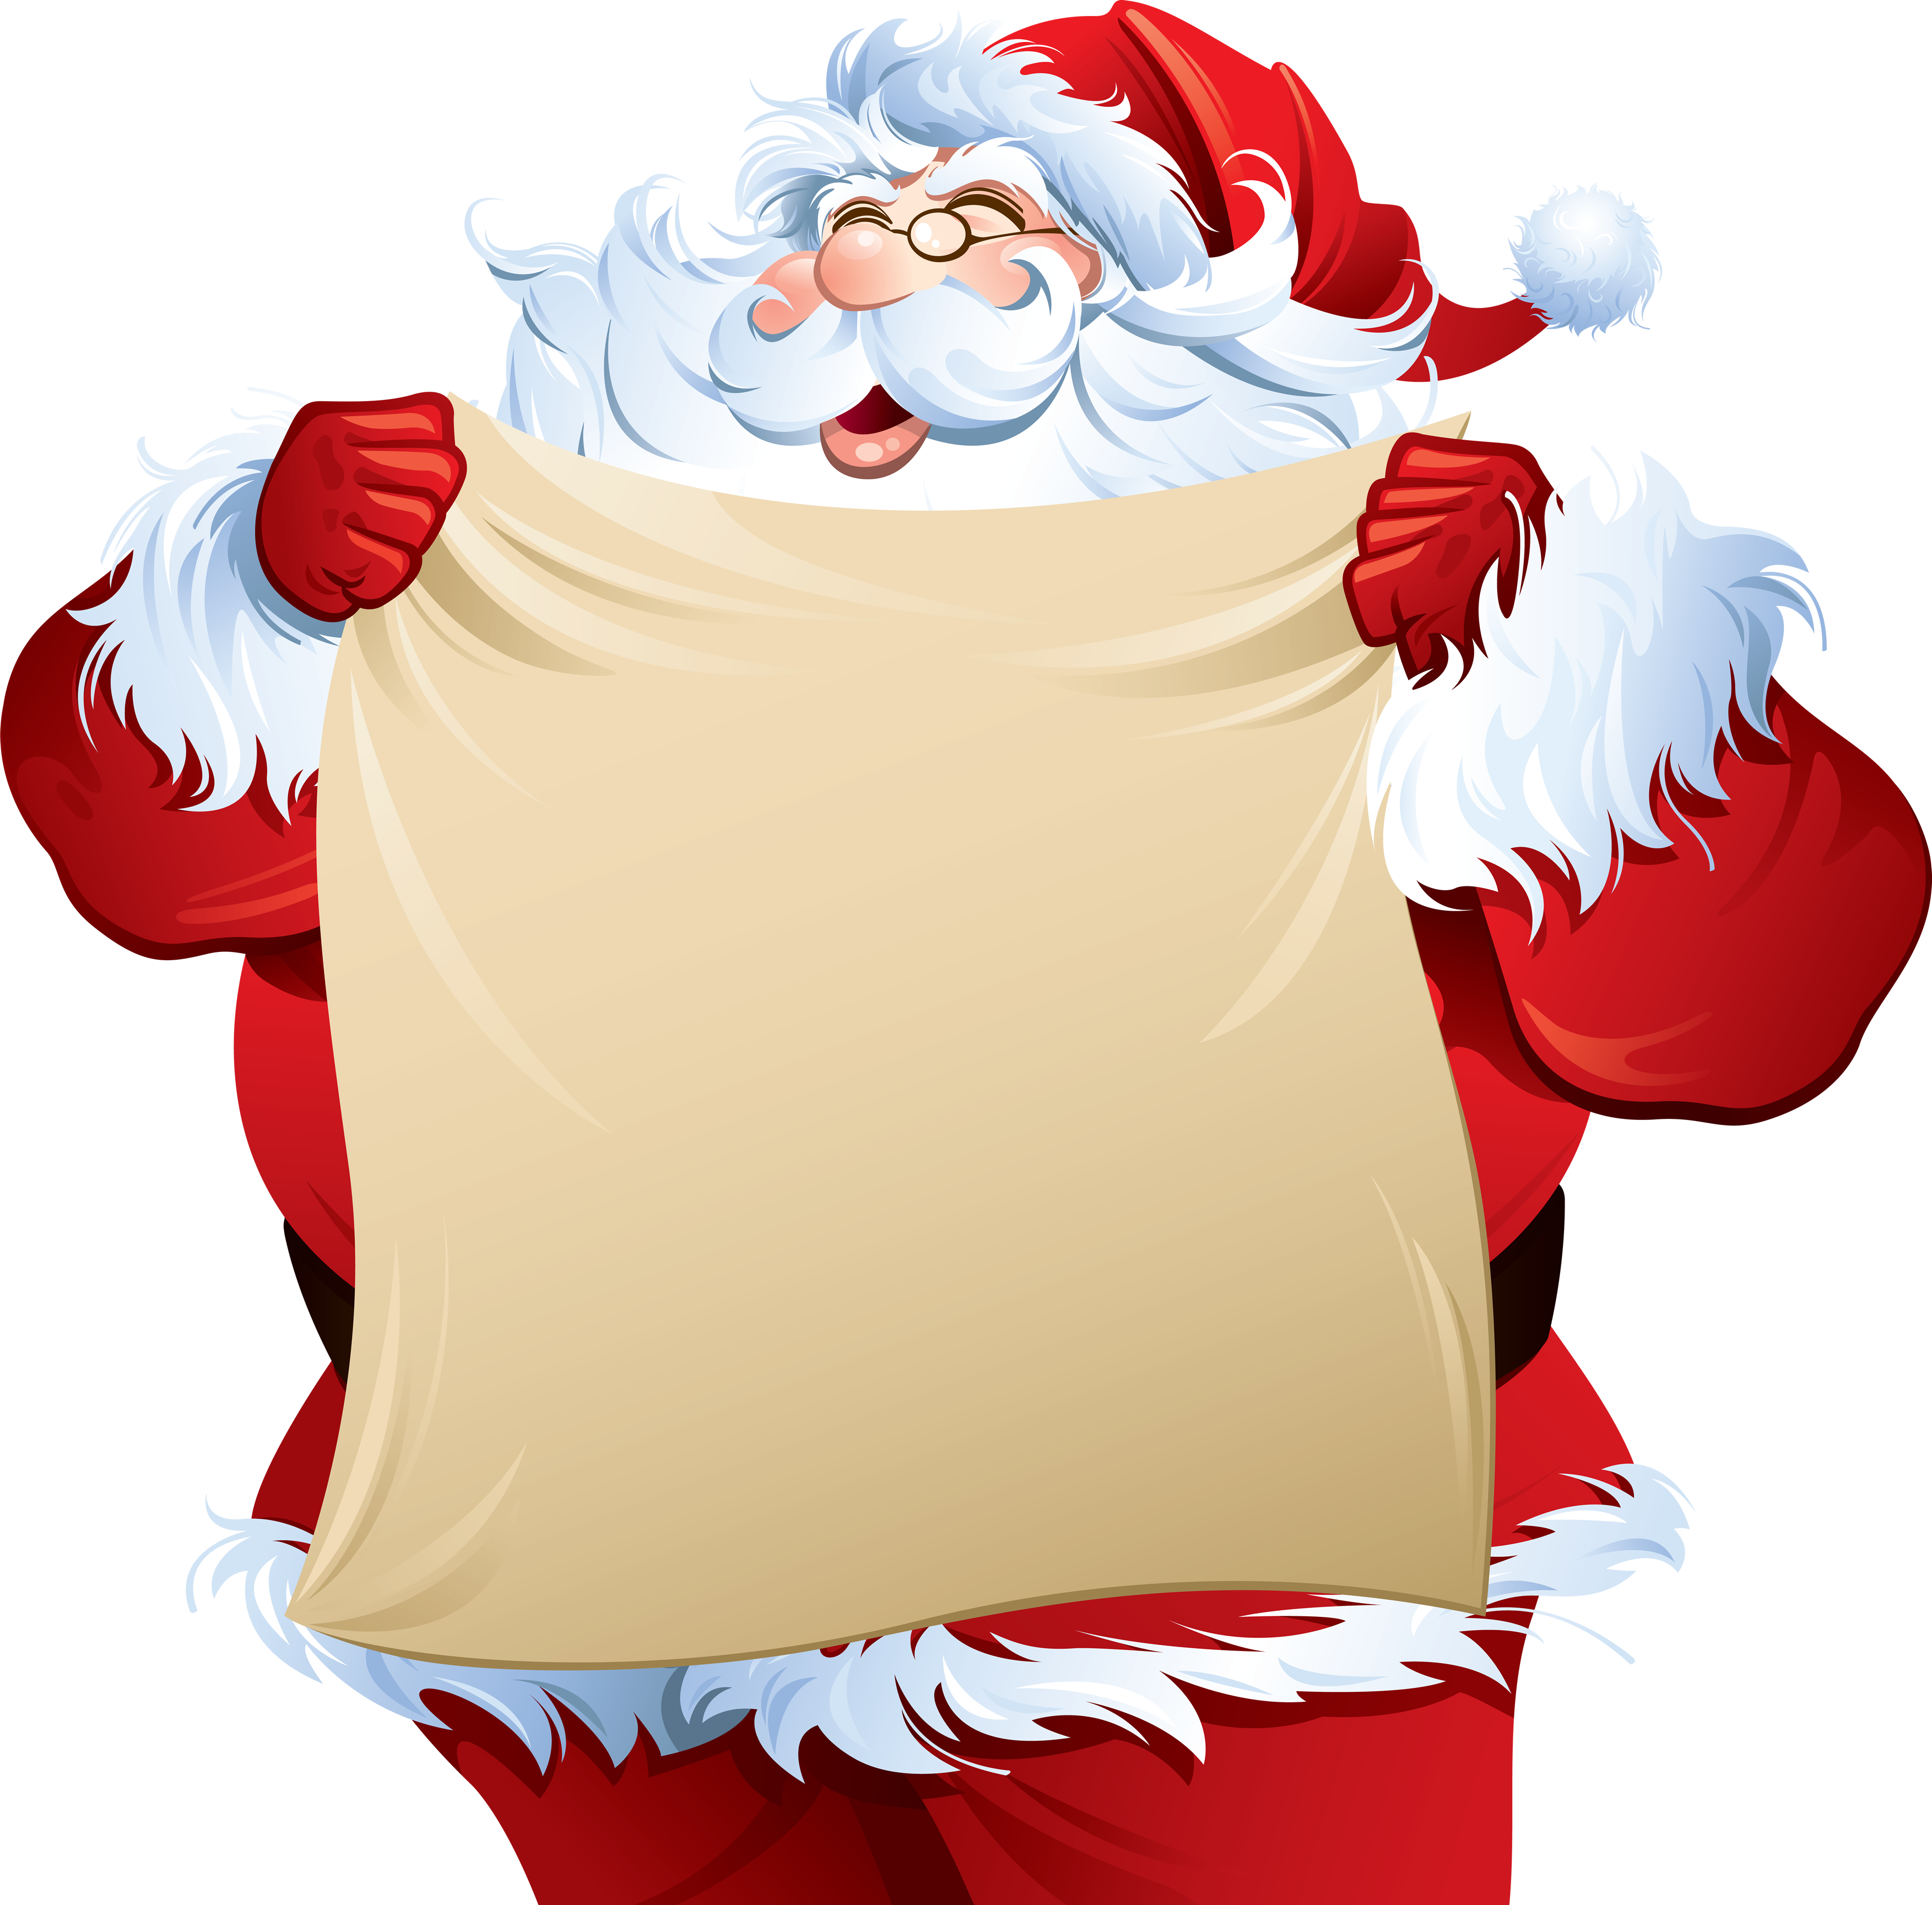 Santa Claus PNG images free download, Santa Claus PNG clip art